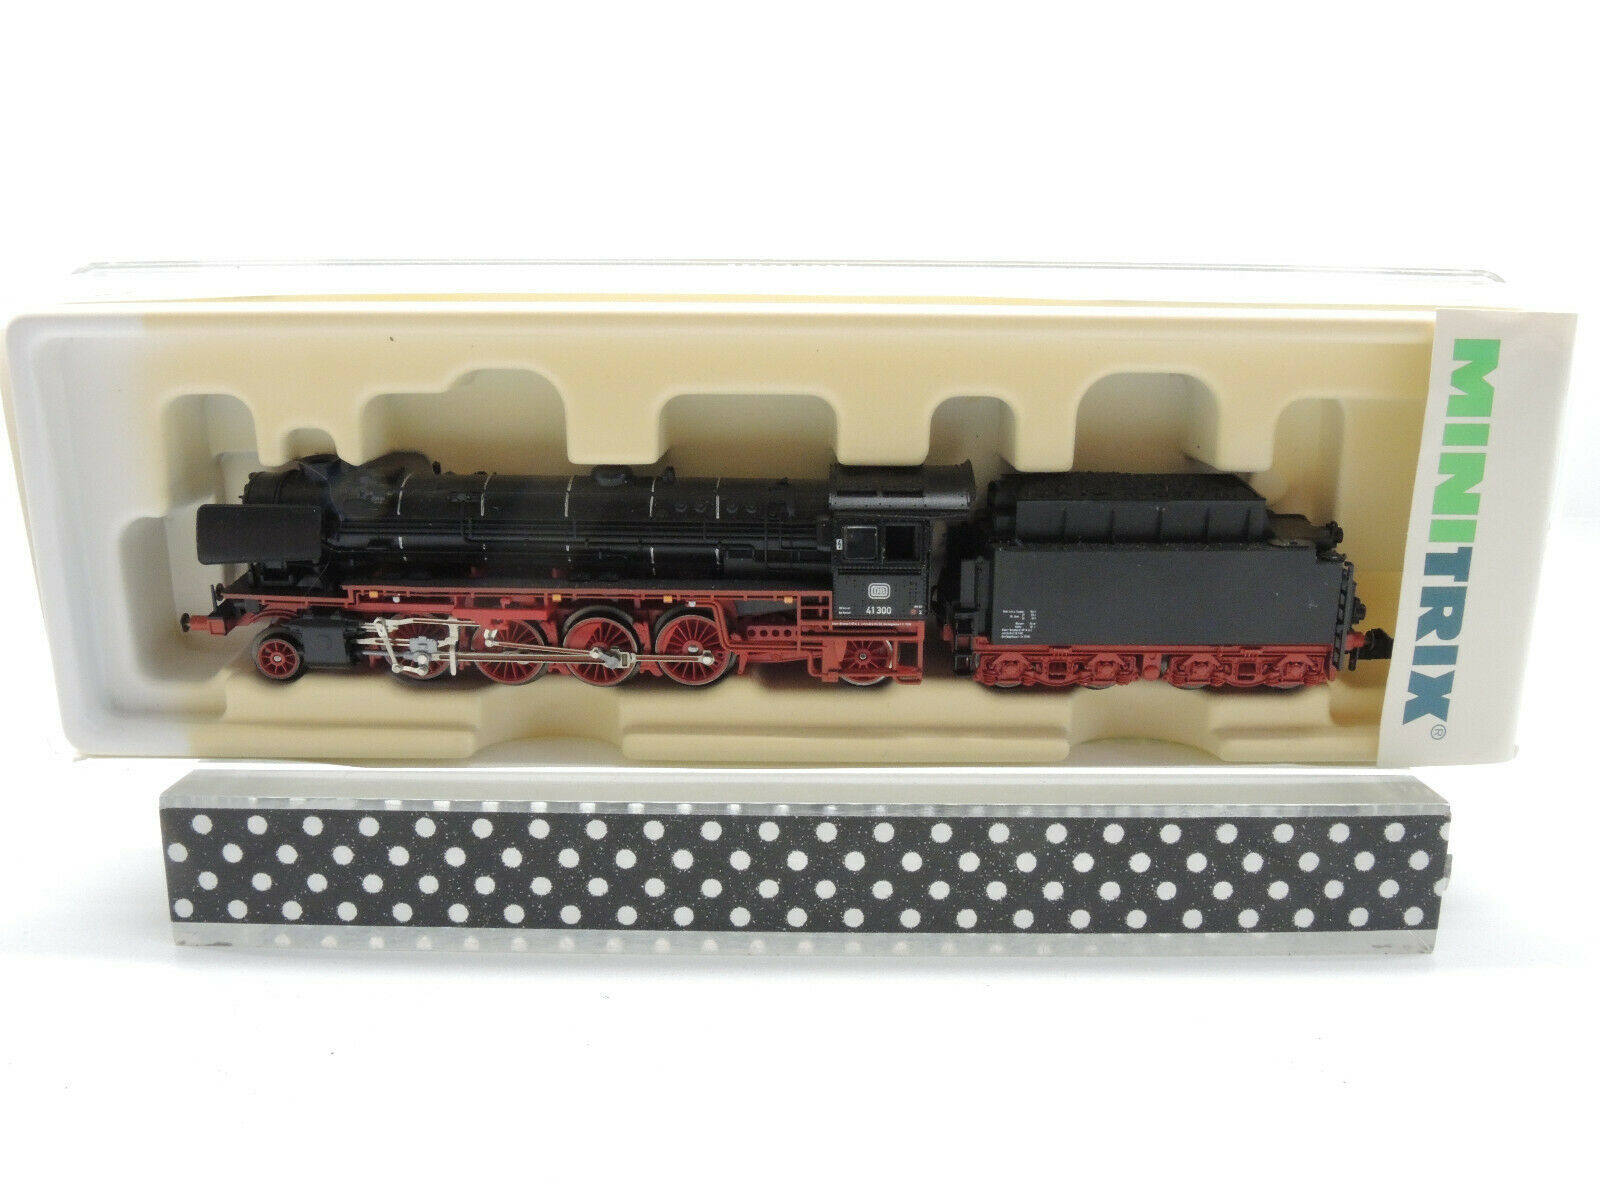 Minitrix 12610 máquina de vapor, schlepptenderlok br 41 300 de la DB, muy bien OVP